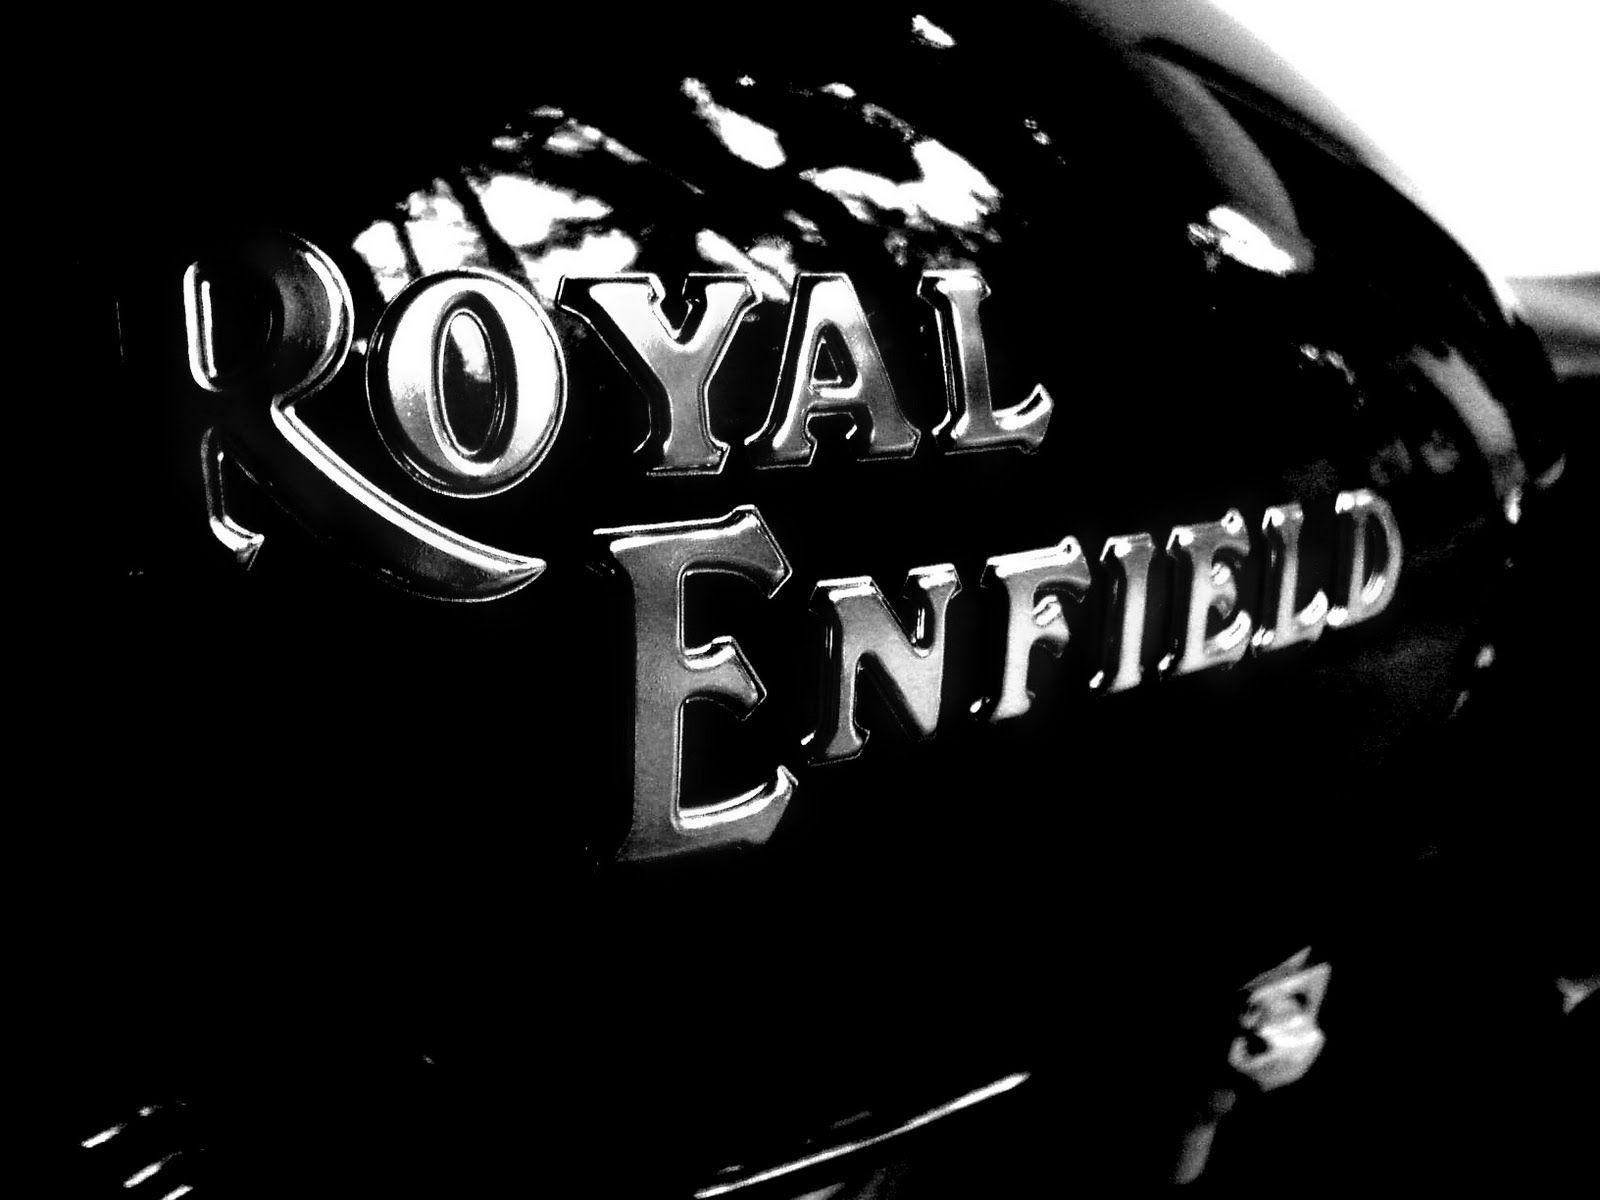 Royal Enfield Wallpapers